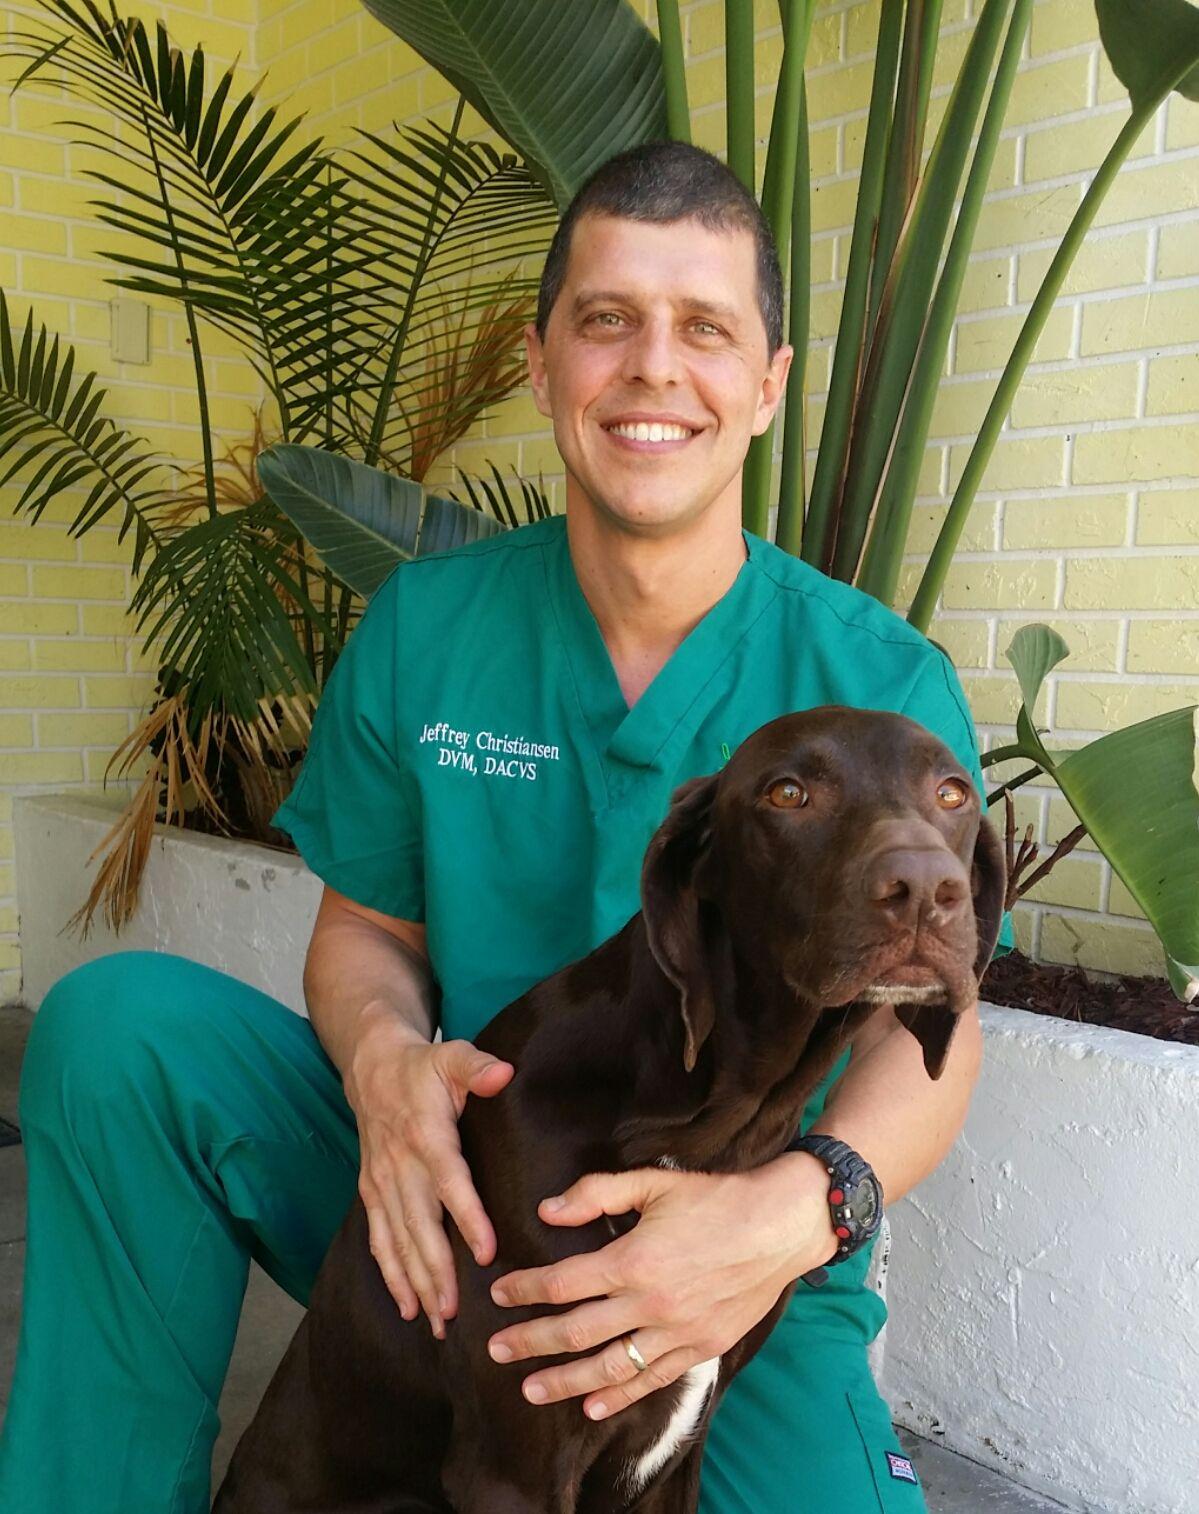 Dr. Jeffrey Christiansen